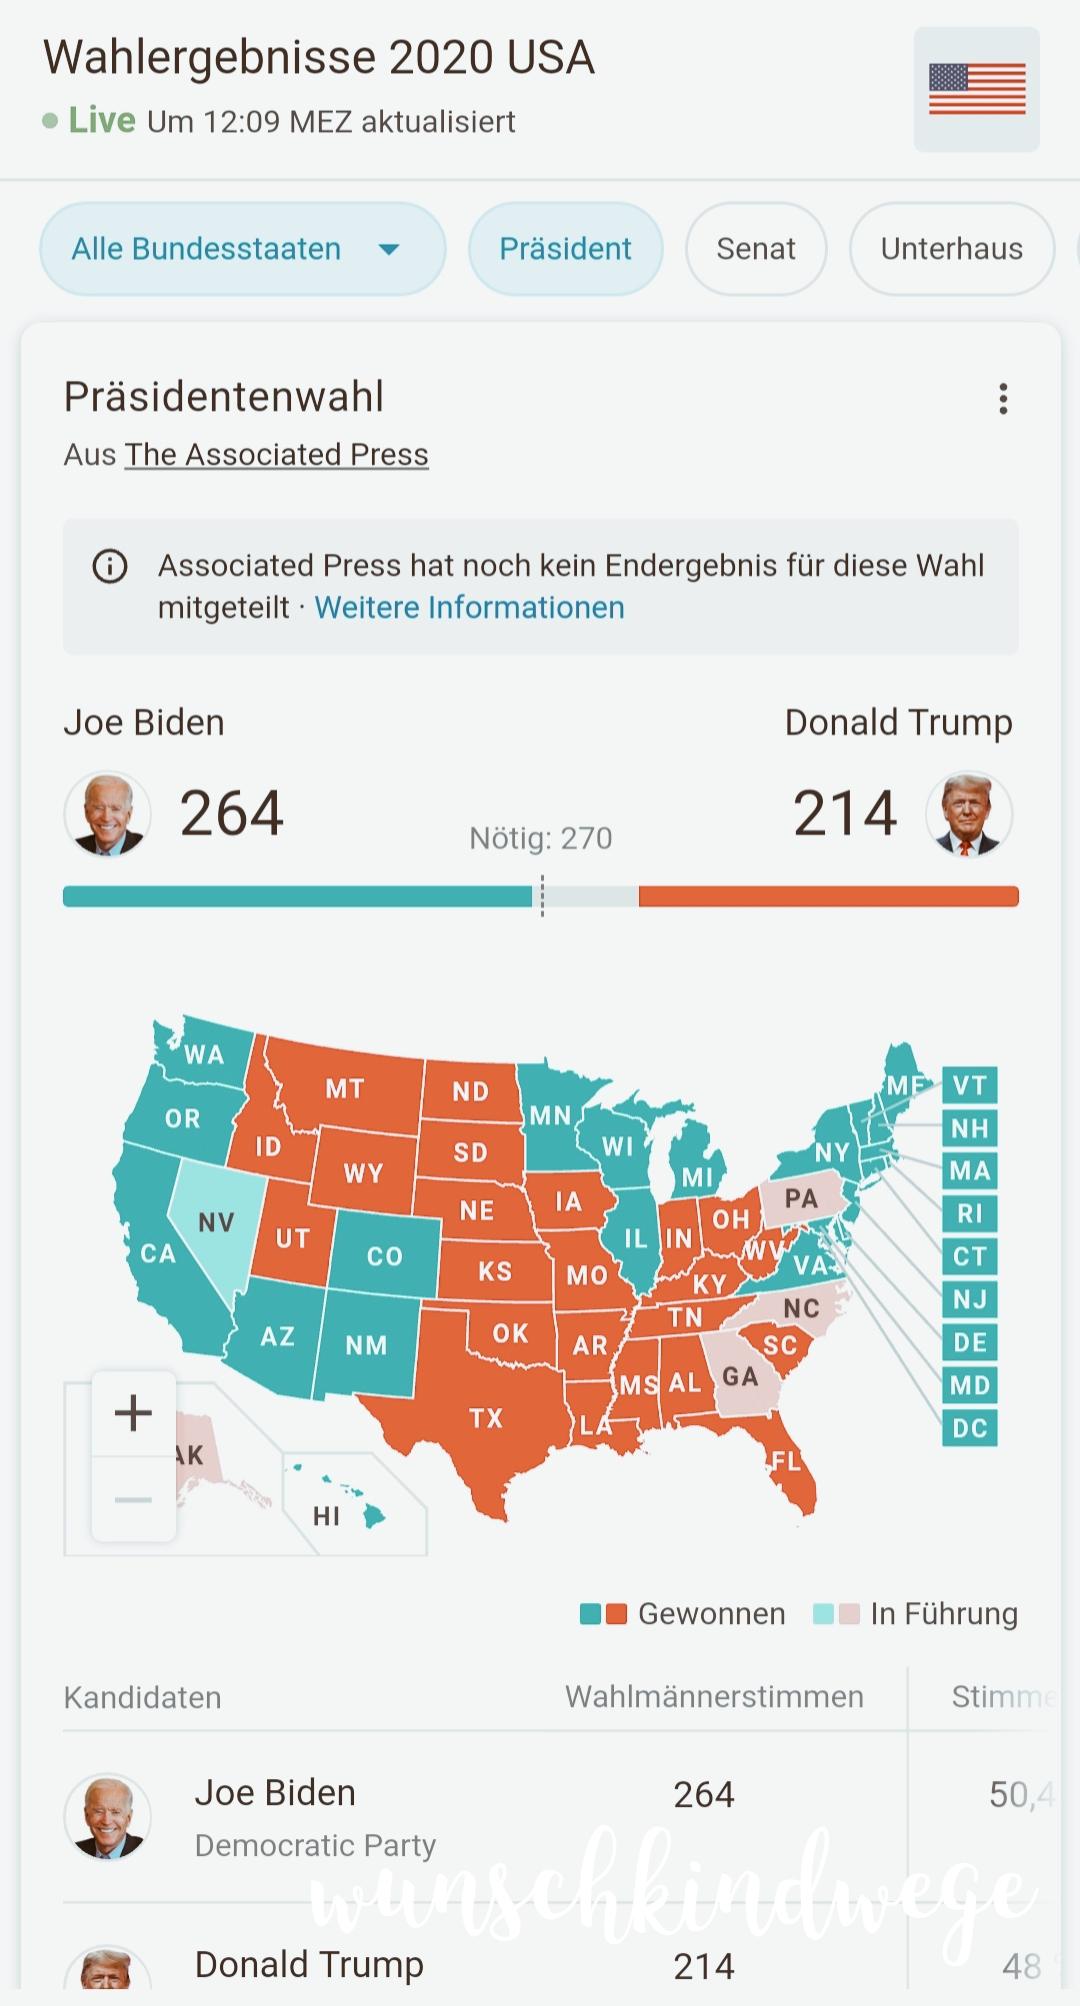 Wahlergebnisse-USA